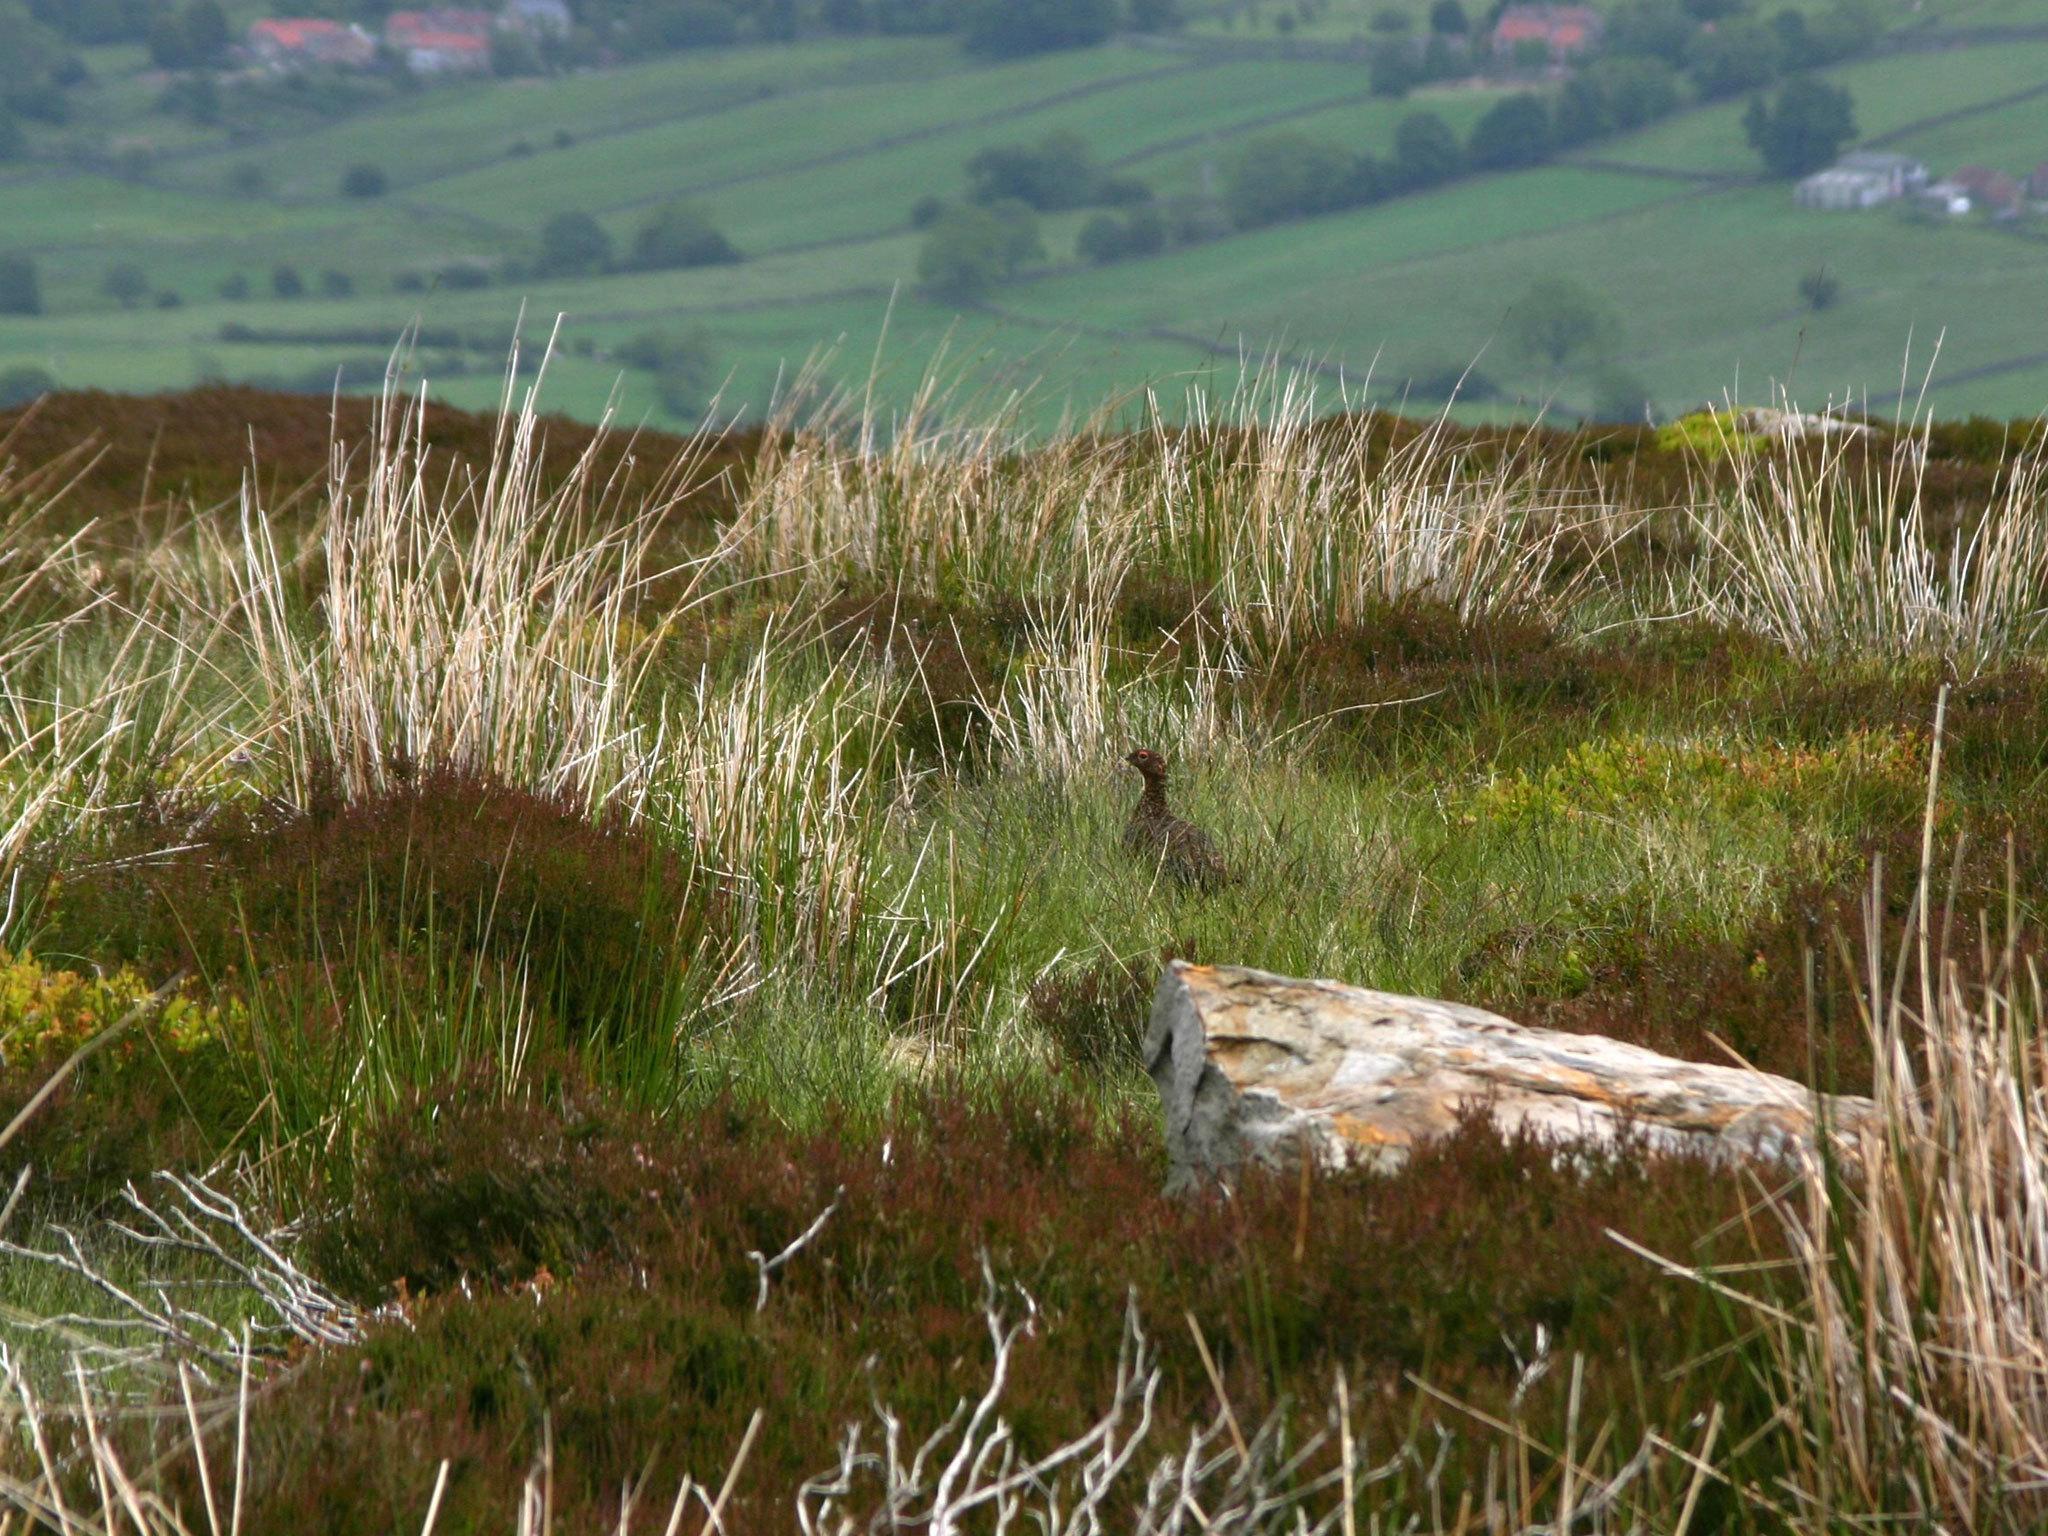 Tumbling hills